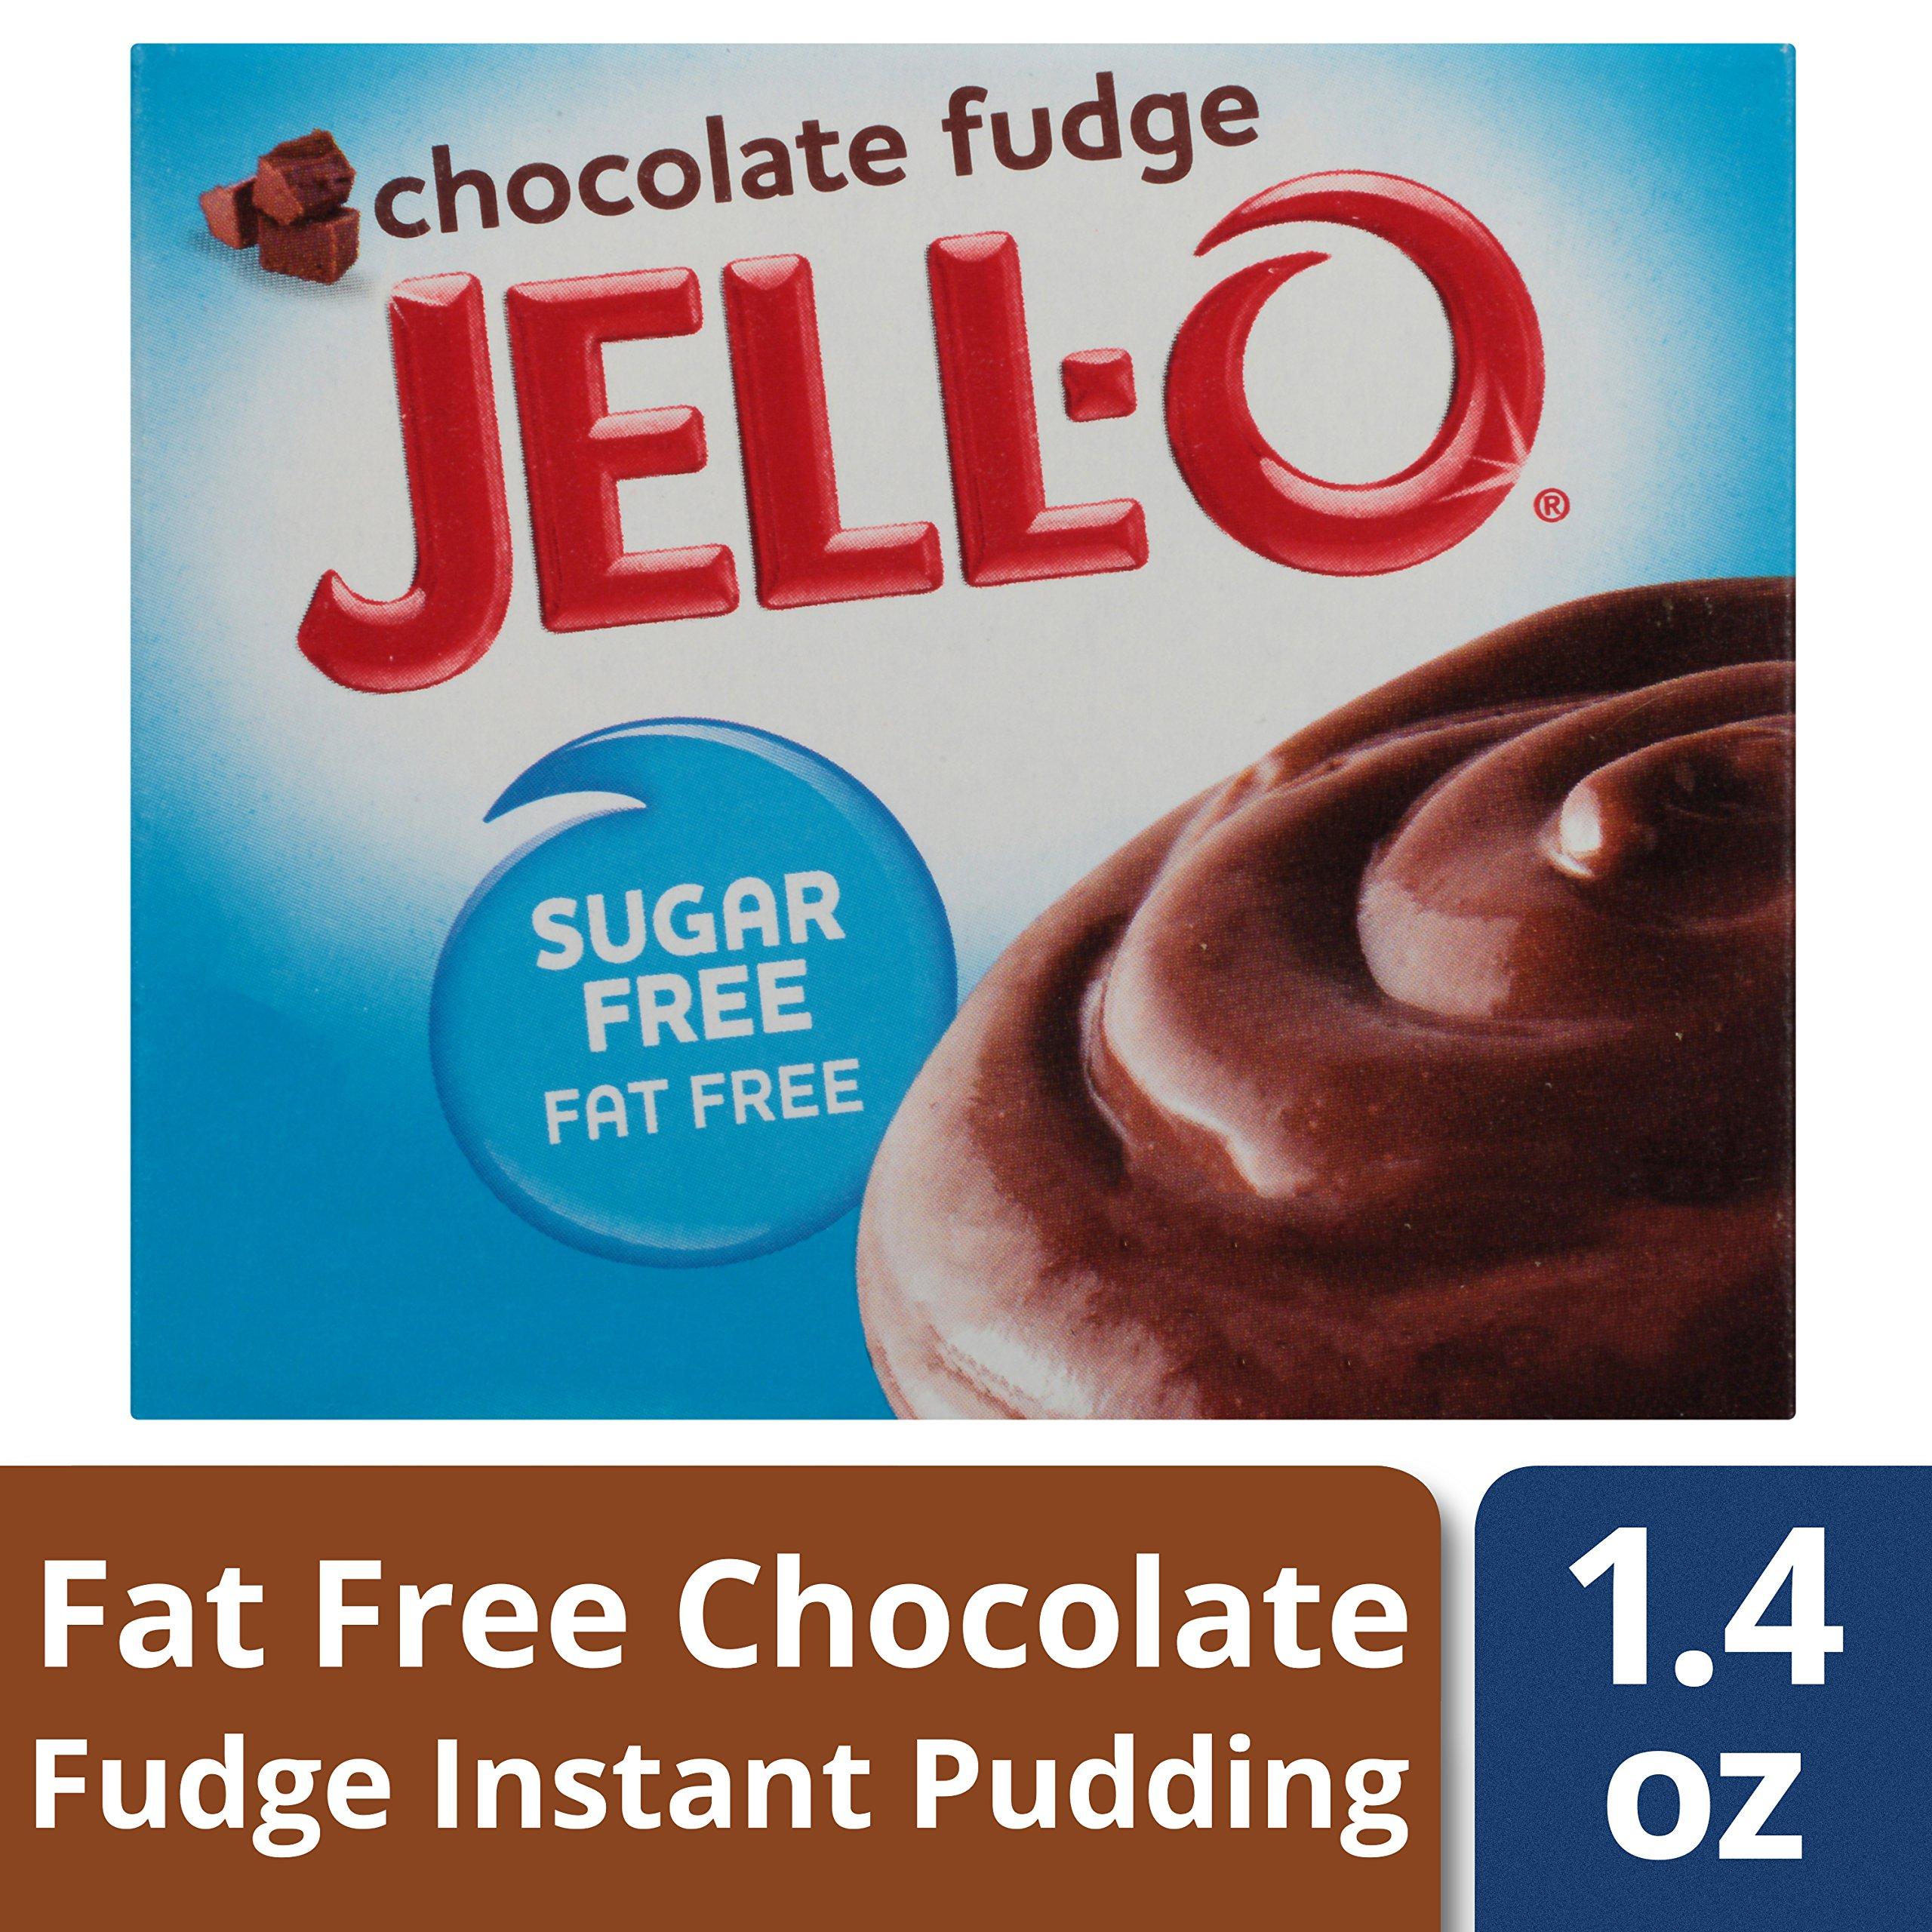 Jell-O Sugar-Free Instant Pudding & Pie Filling, Chocolate Fudge, 1.4 oz